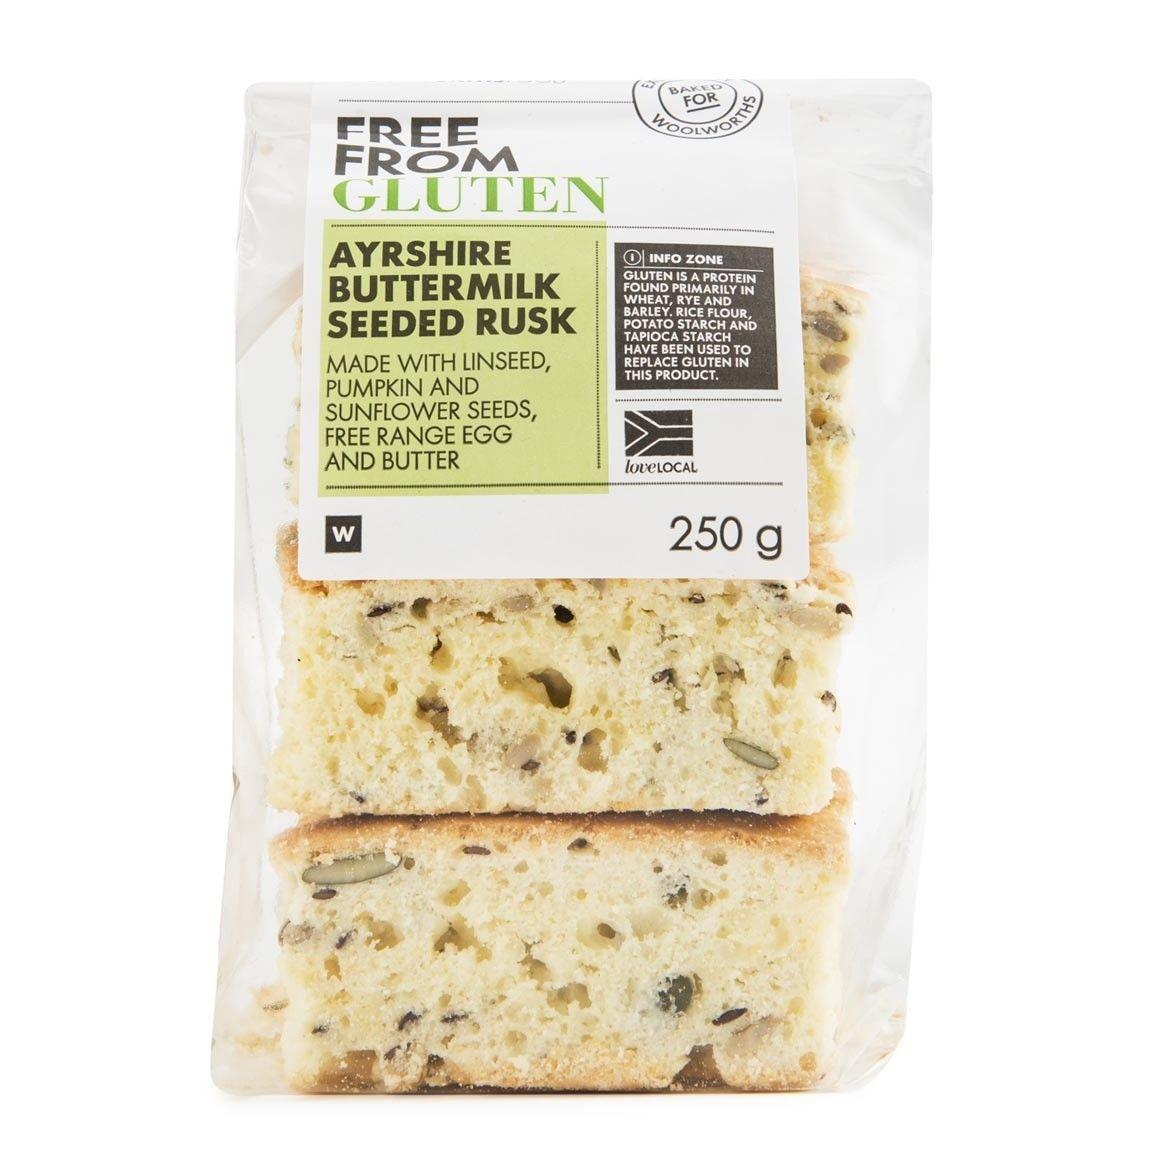 Gluten Free Ayrshire Buttermilk Seeded Rusk 250g Food